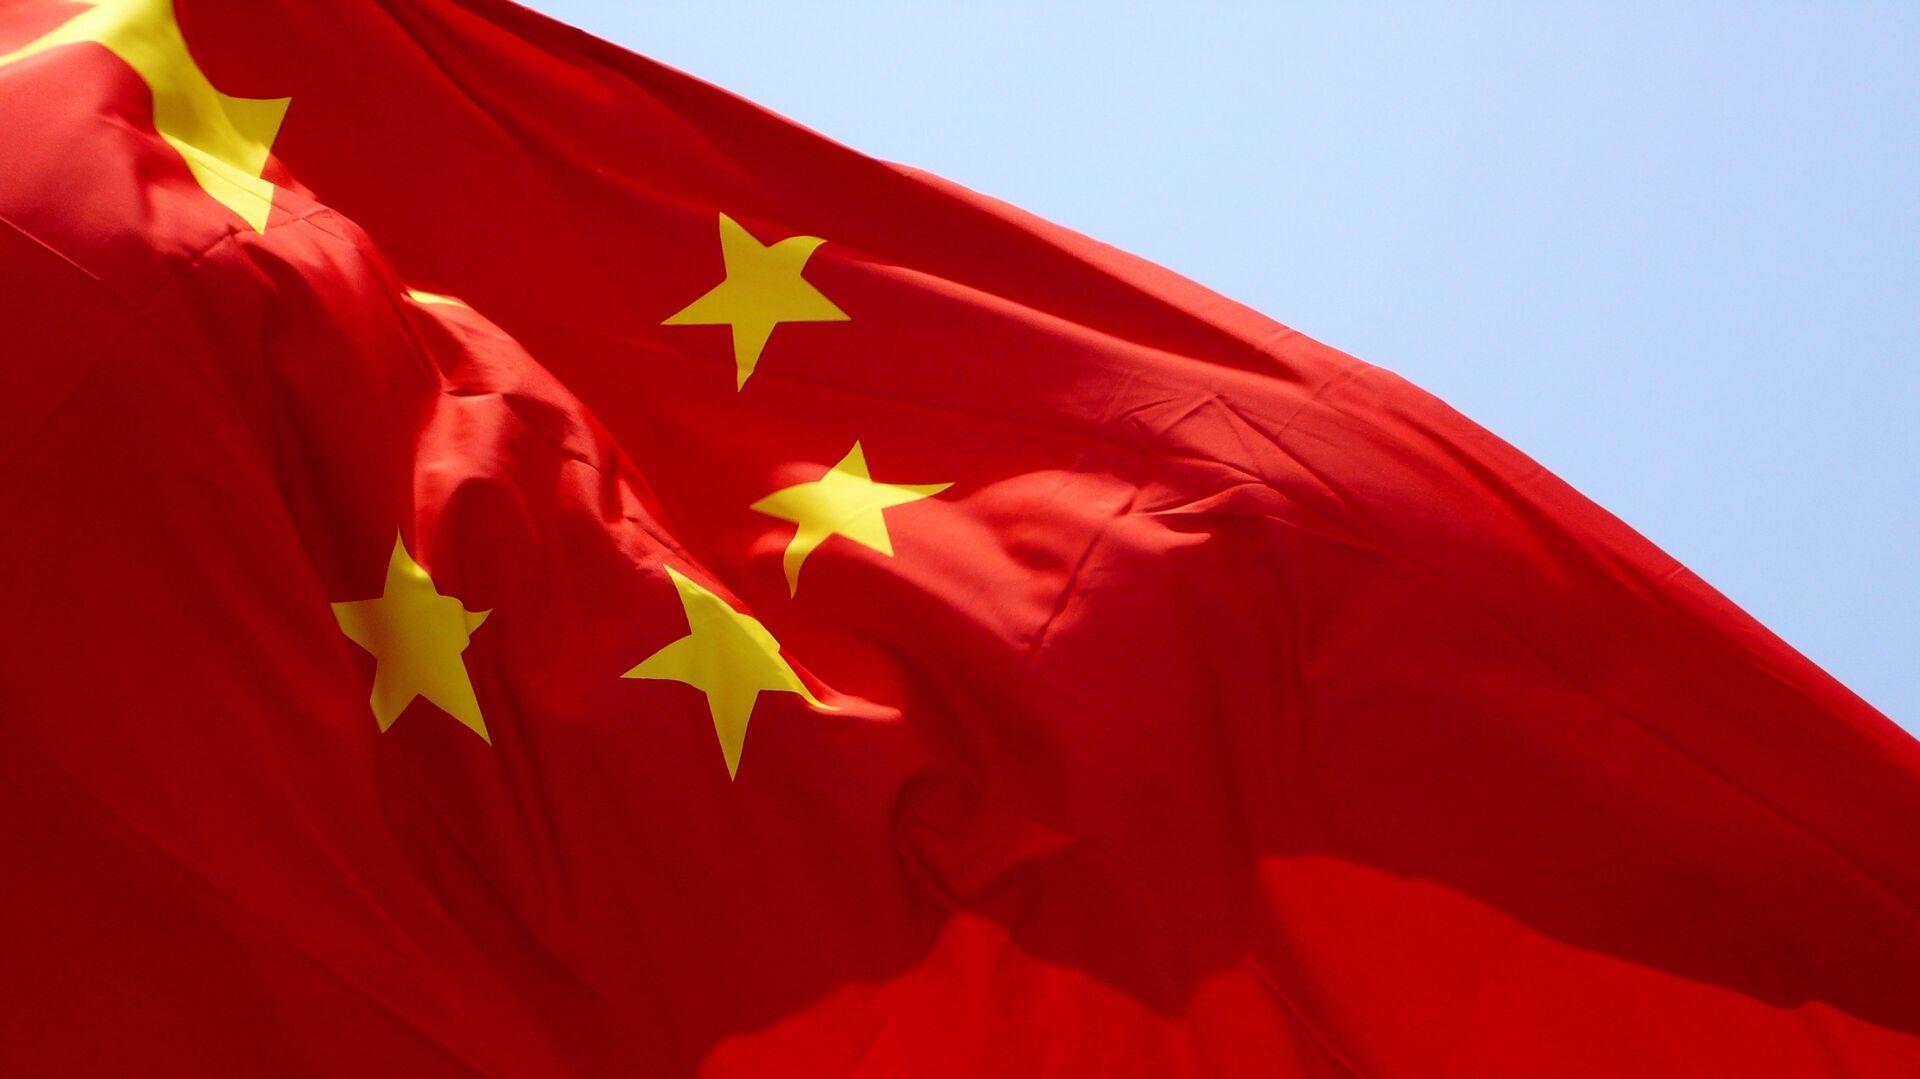 Bandera de China - Sputnik Mundo, 1920, 05.08.2021